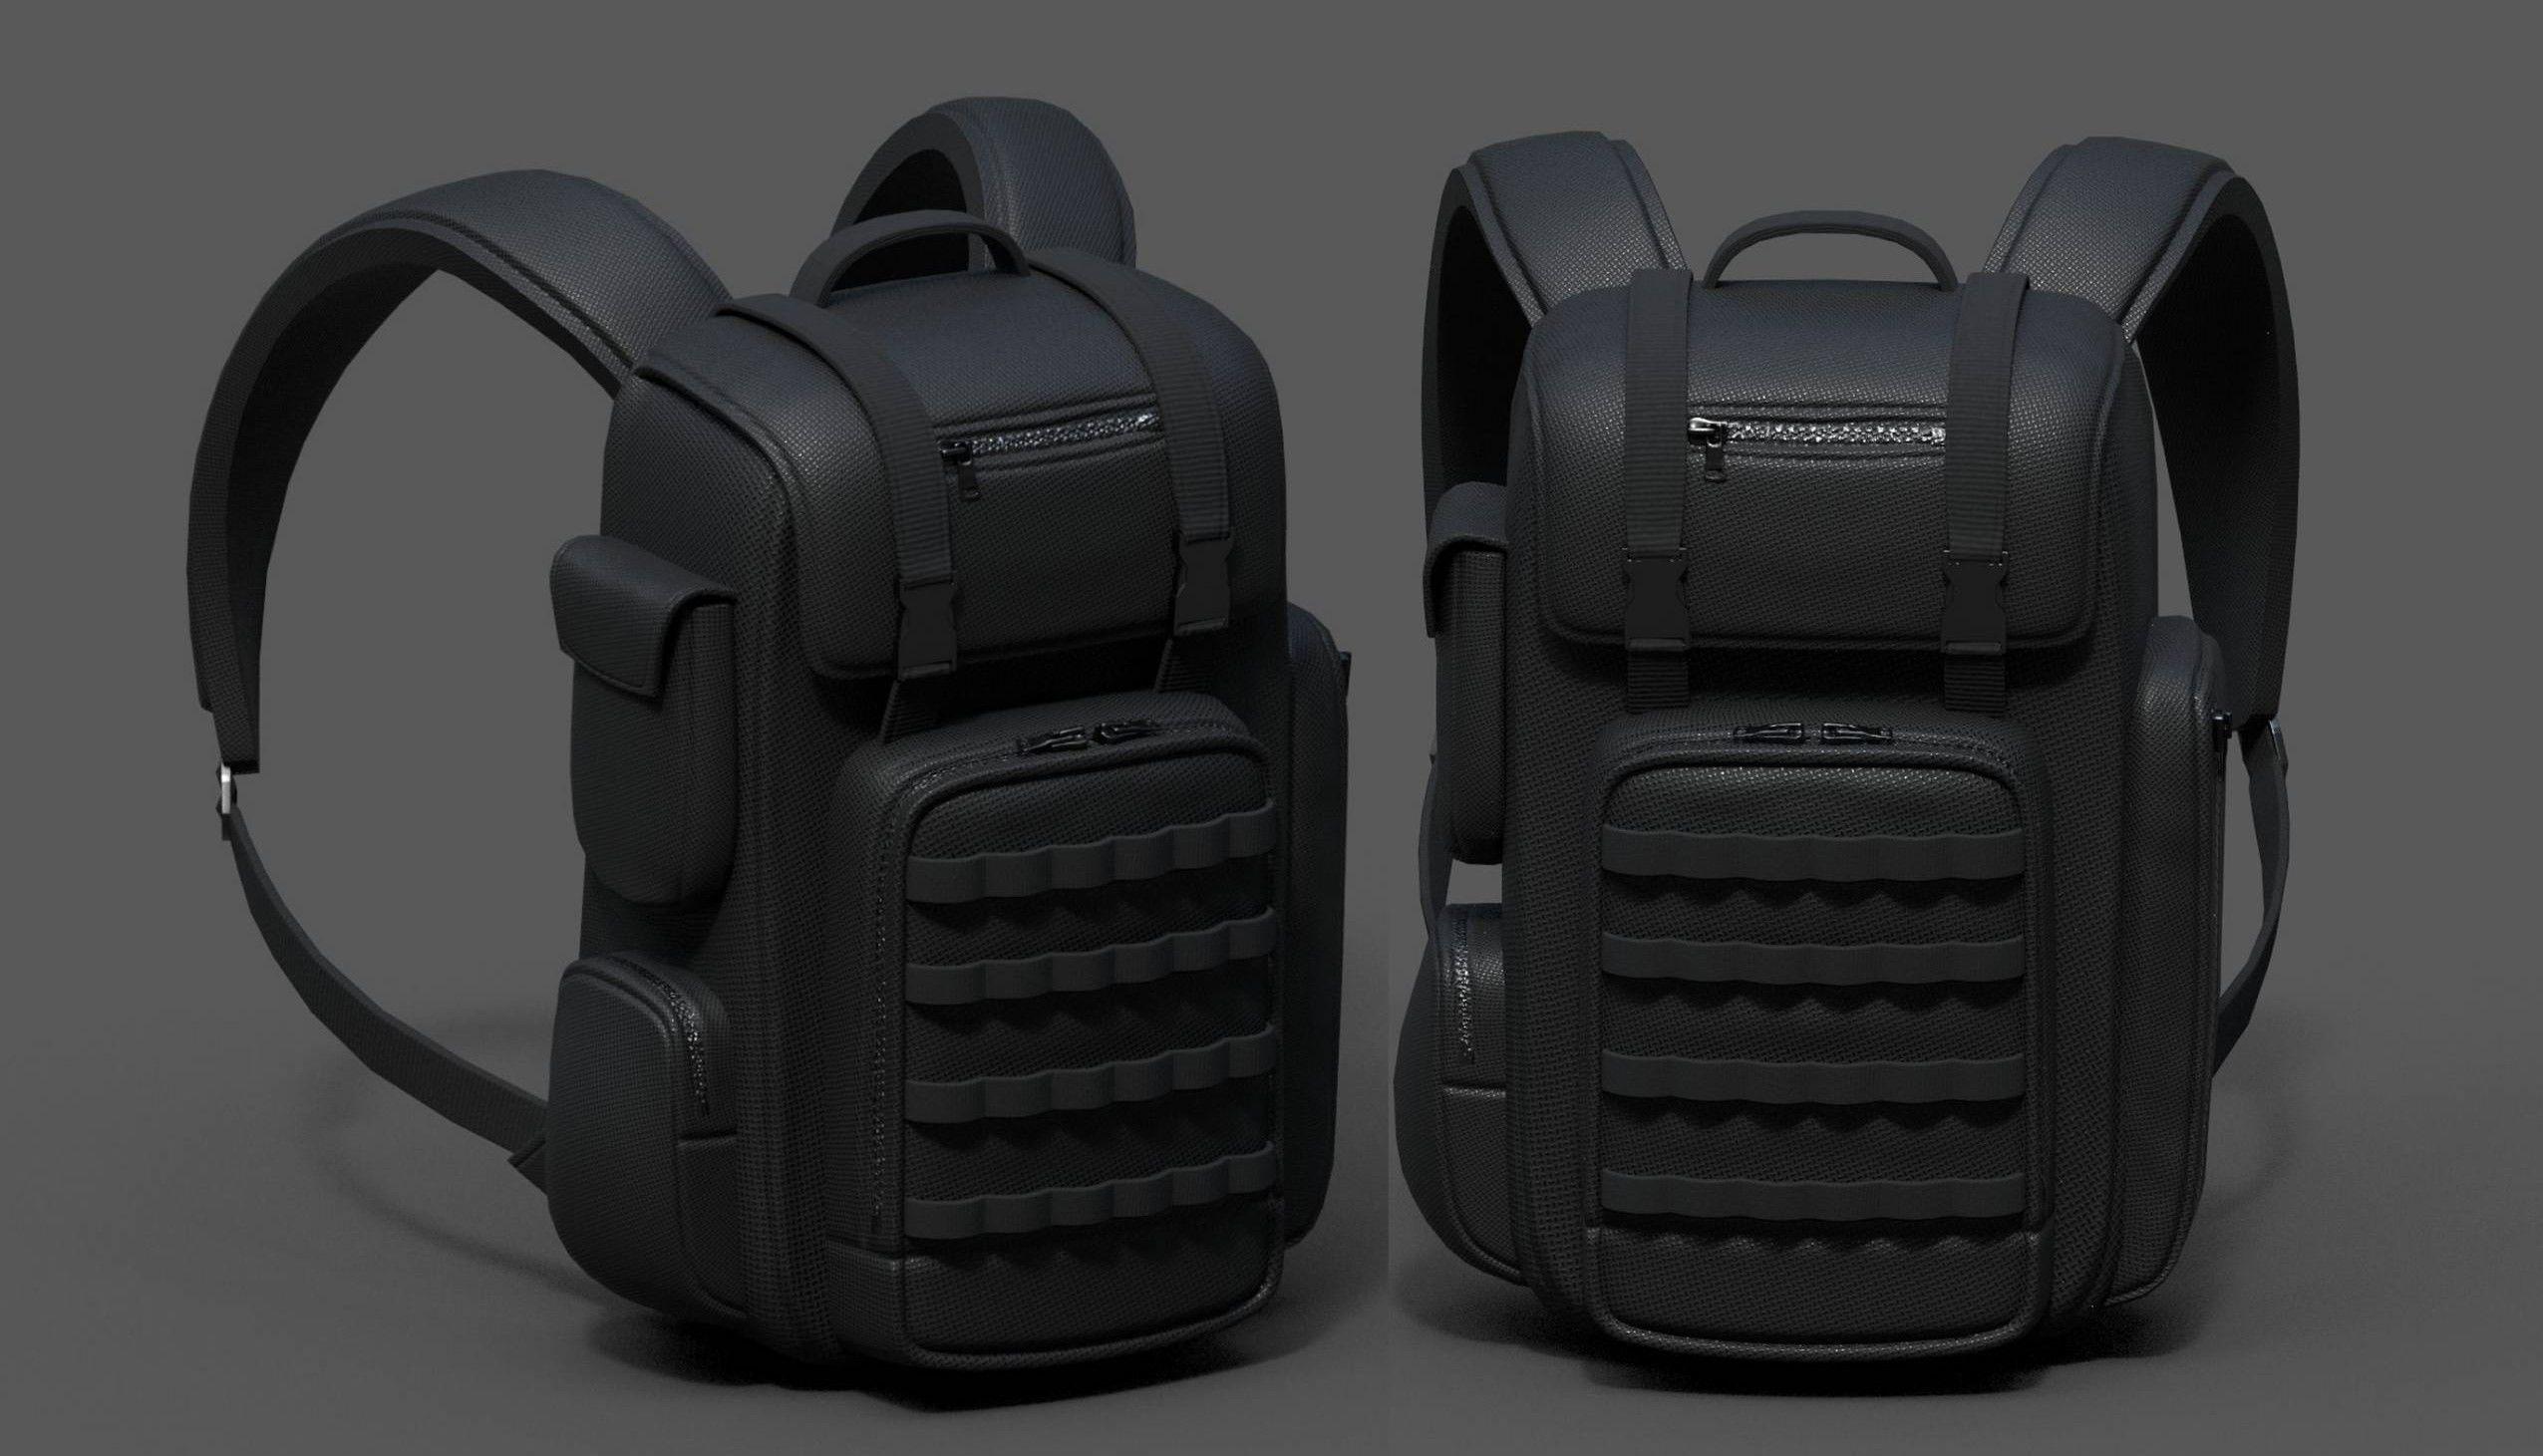 Backpack Camping bag baggage Black